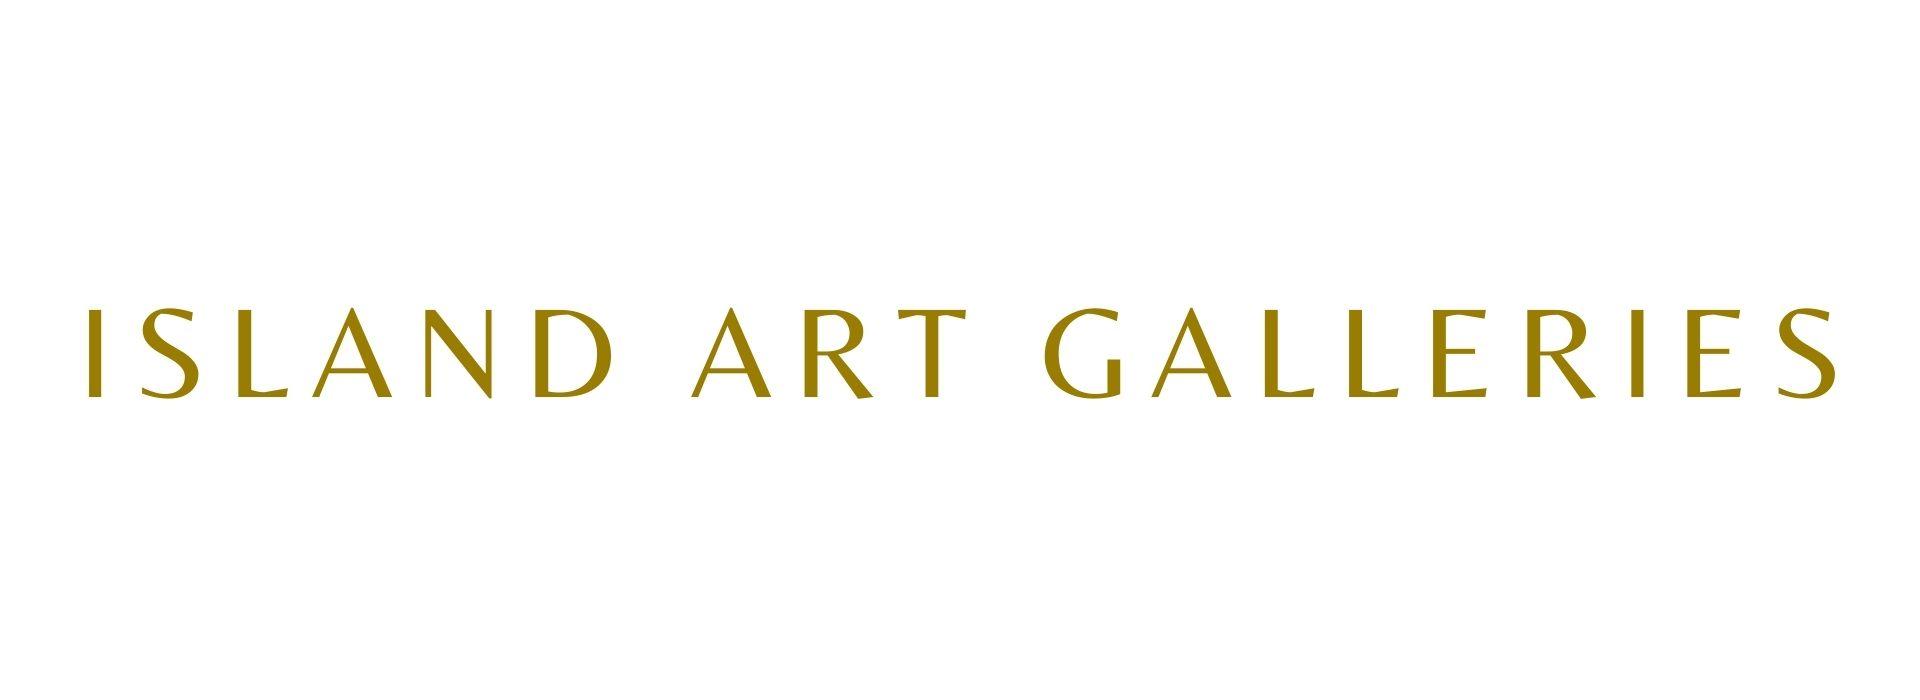 Island Art Galleries Logo